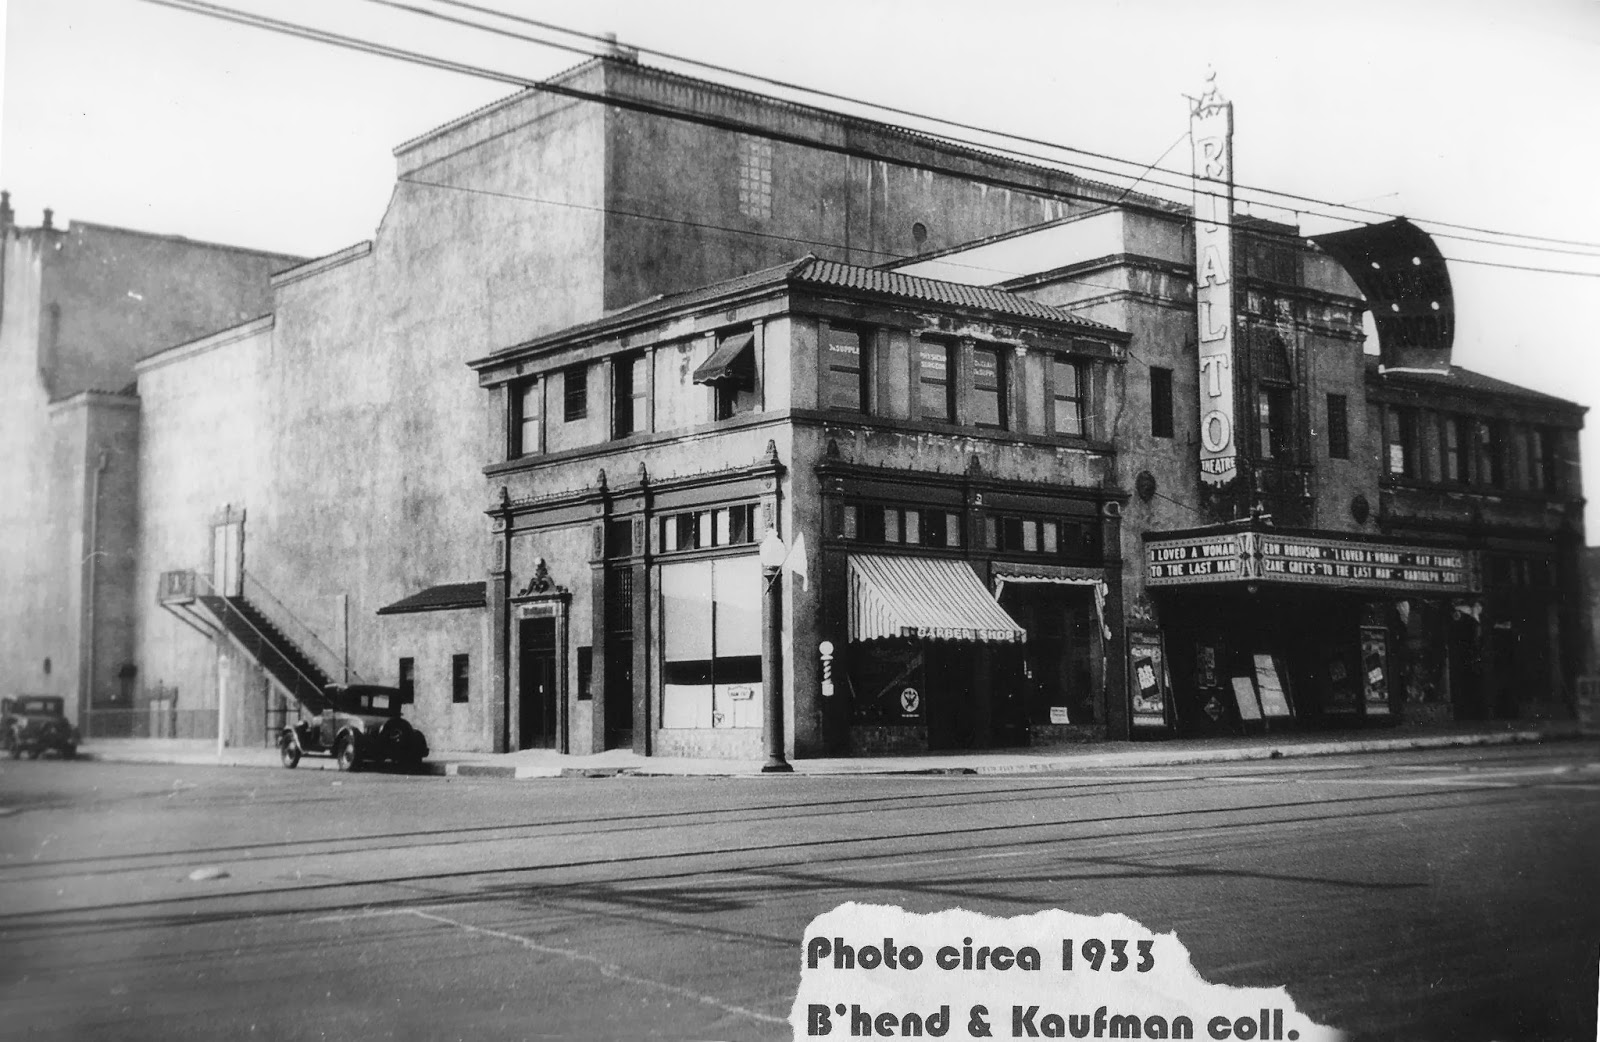 Angeles bridge los movie theater